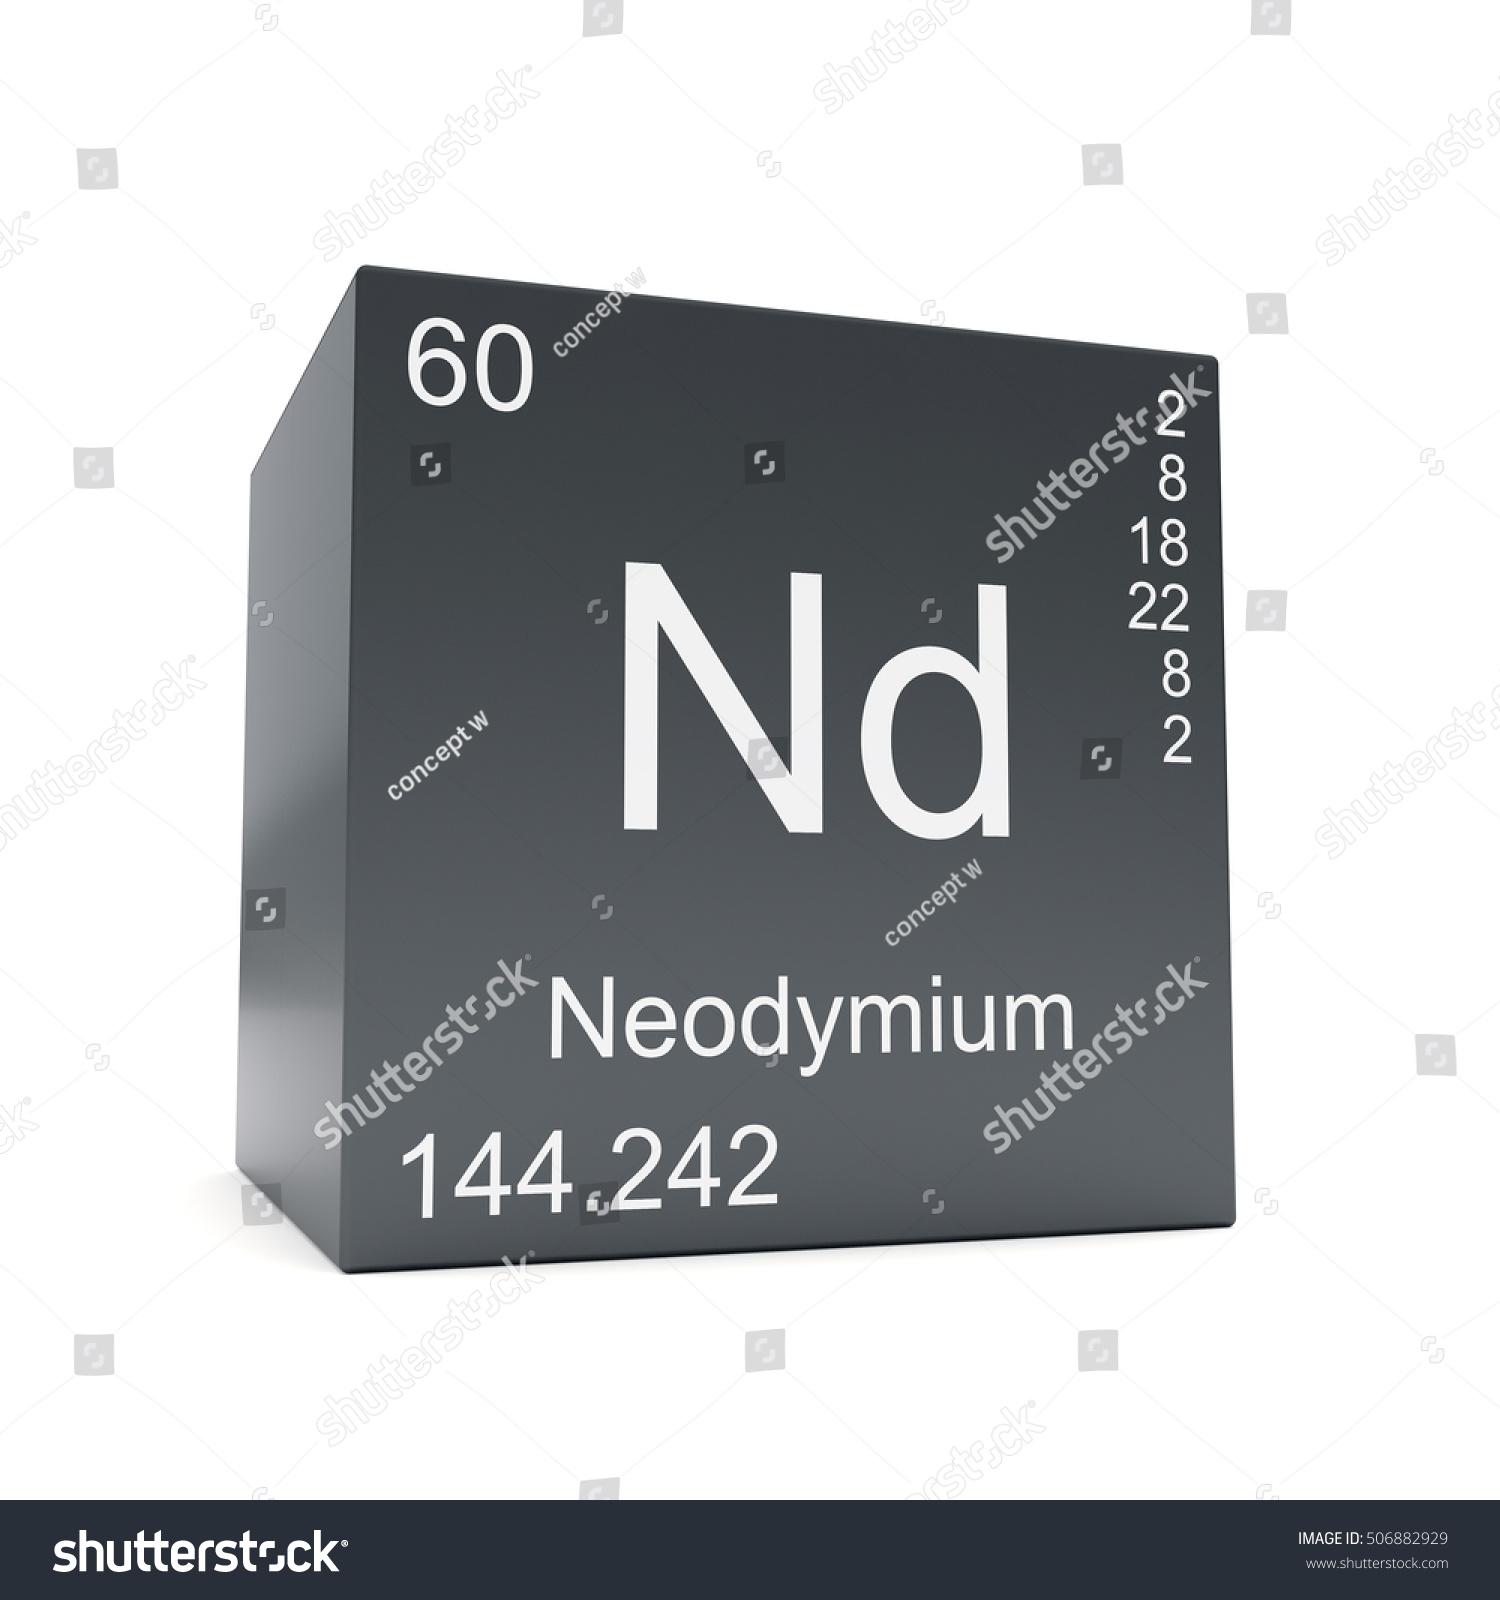 Neodymium chemical element symbol periodic table stock neodymium chemical element symbol from the periodic table displayed on black cube 3d render gamestrikefo Choice Image